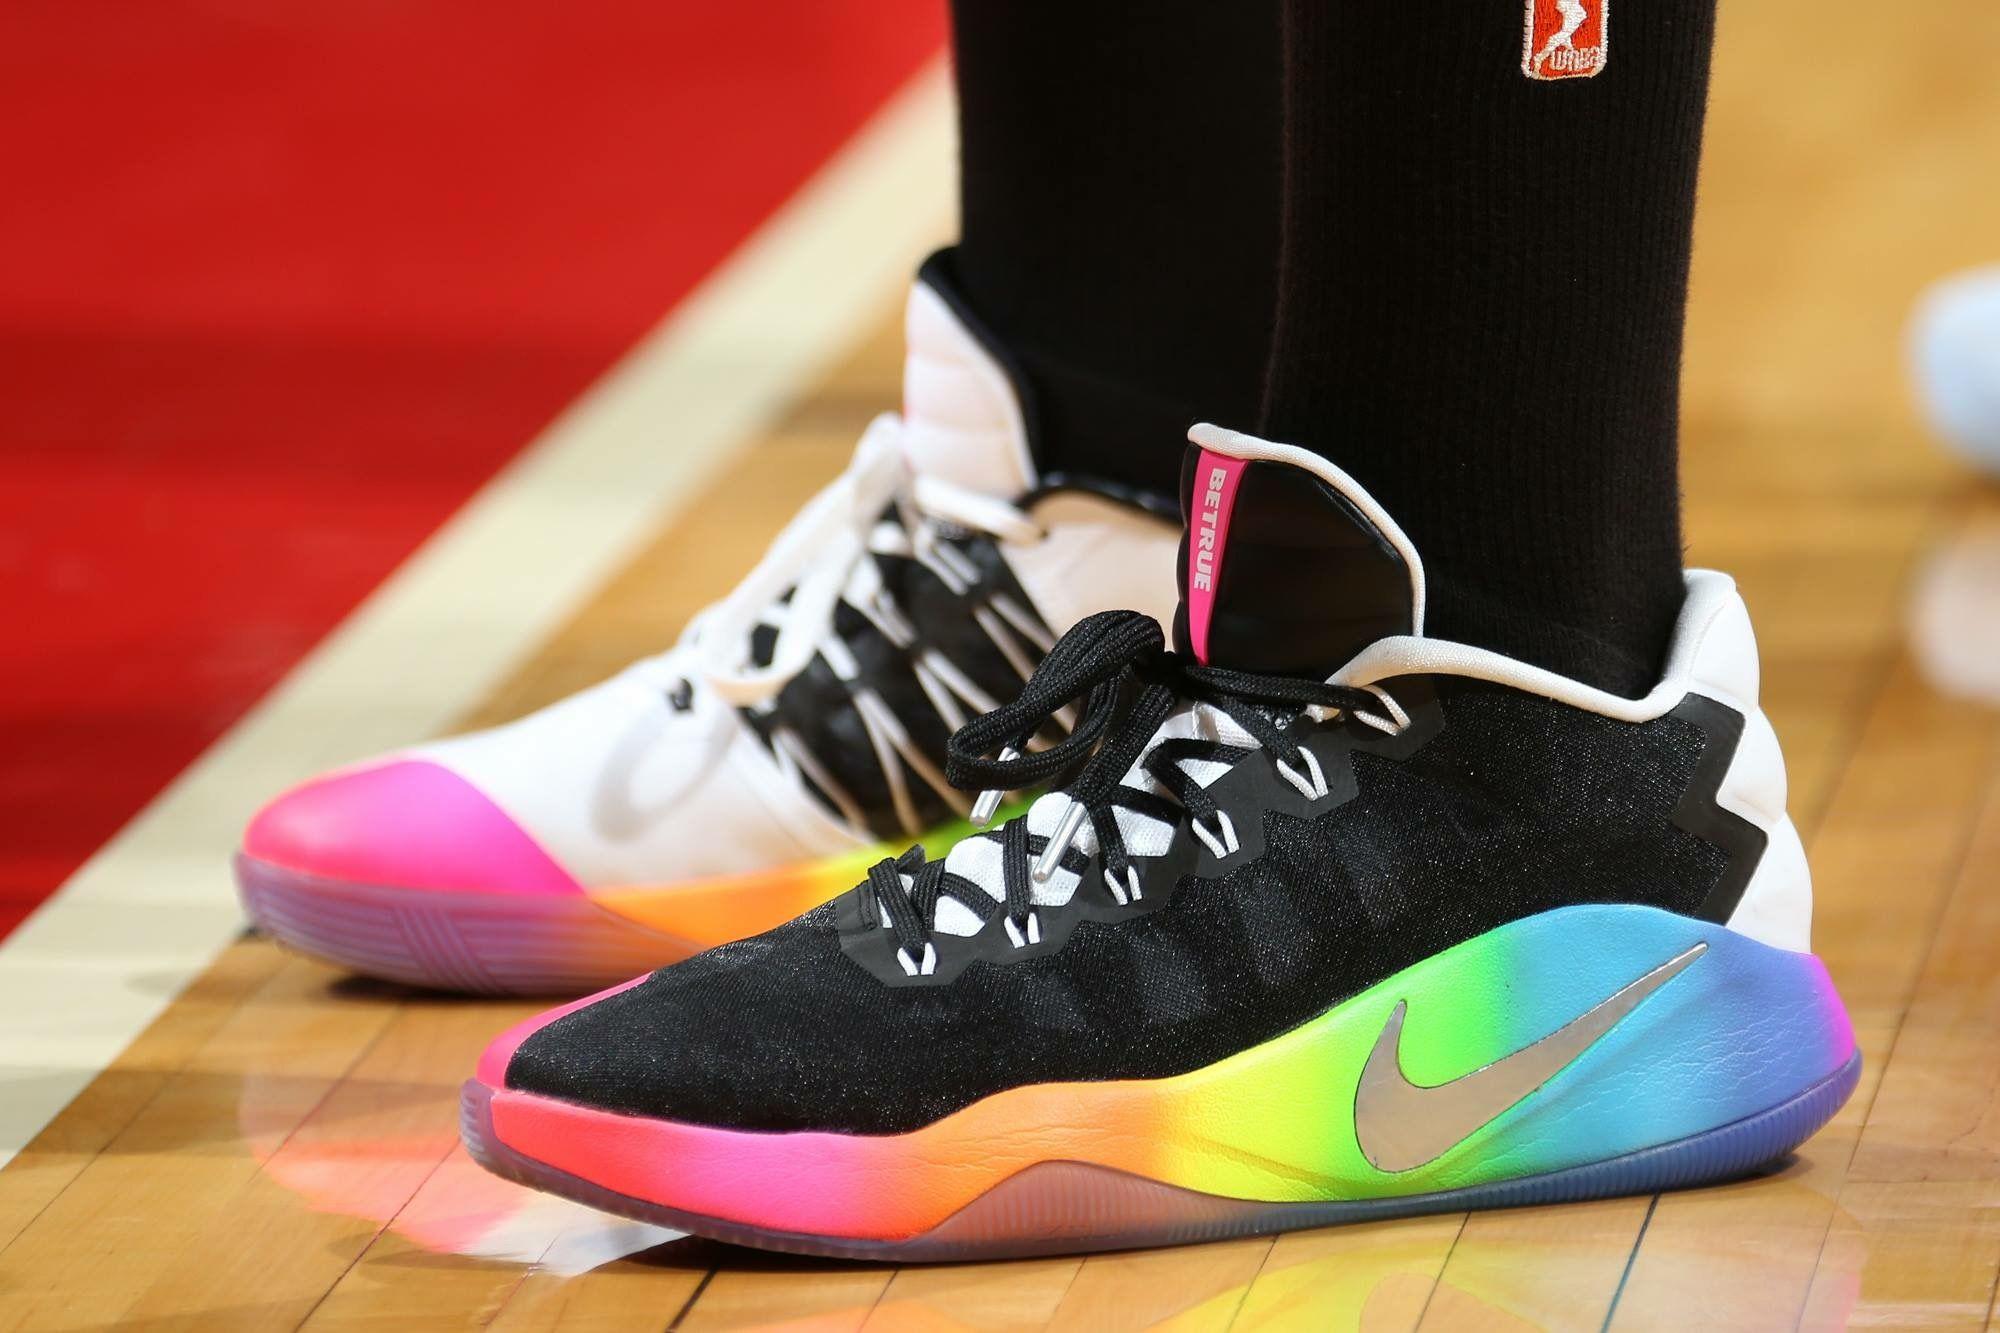 plátano Dispuesto Moda  Elena Delle Donne's #WNBAPride kicks #NIKE | Sneaker head, Sneakers,  Sneakers nike